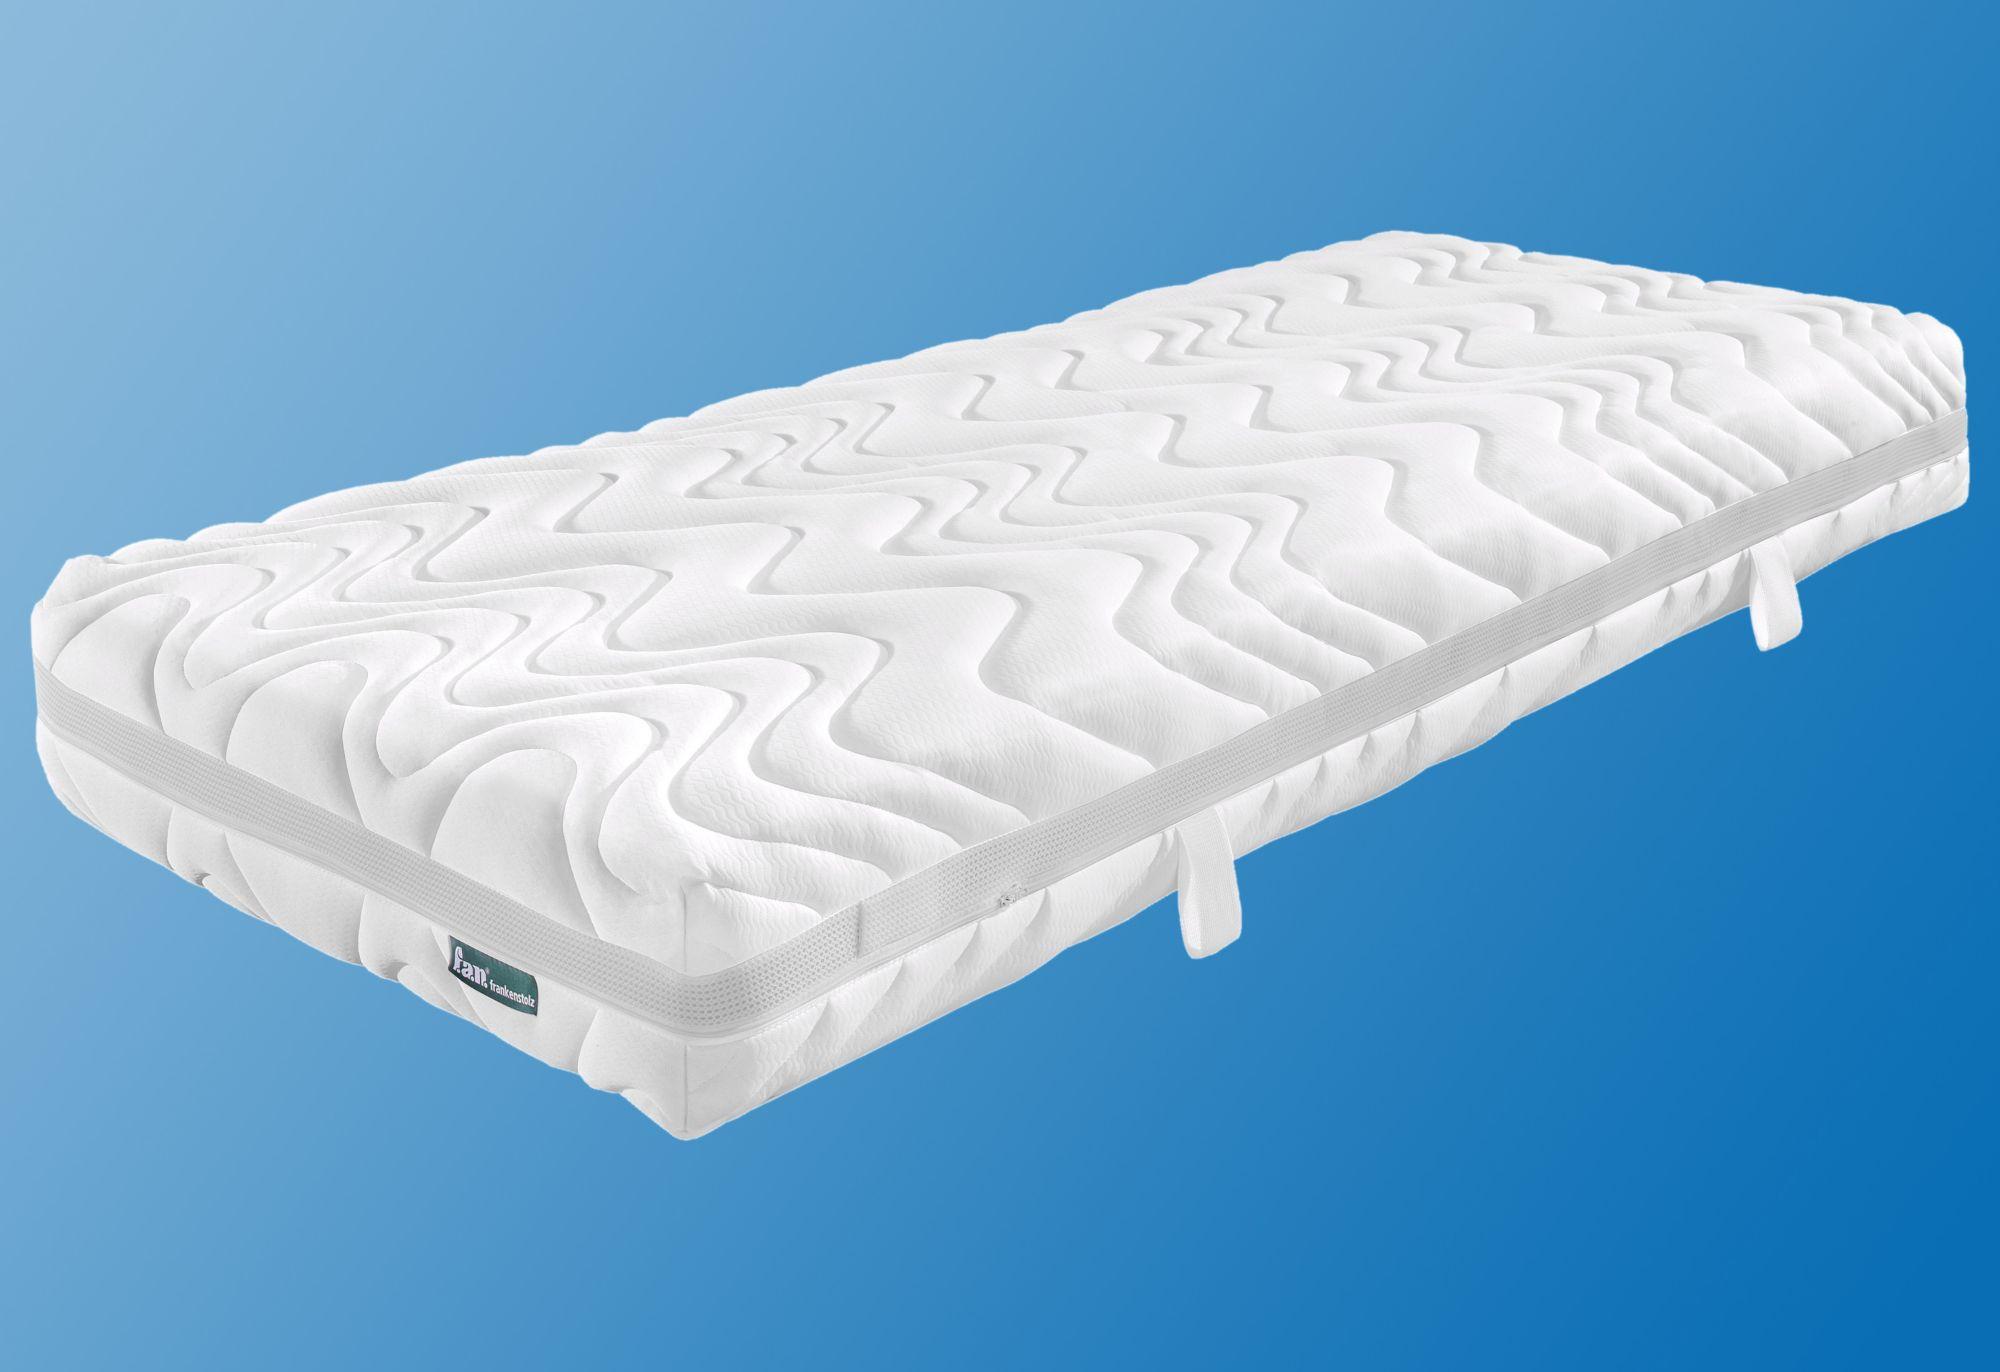 FAN FRANKENSTOLZ Komfortschaummatratze, »Climasan Relax 1.000 S«, f.a.n. Frankenstolz, 24 cm hoch, Raumgewicht: 30